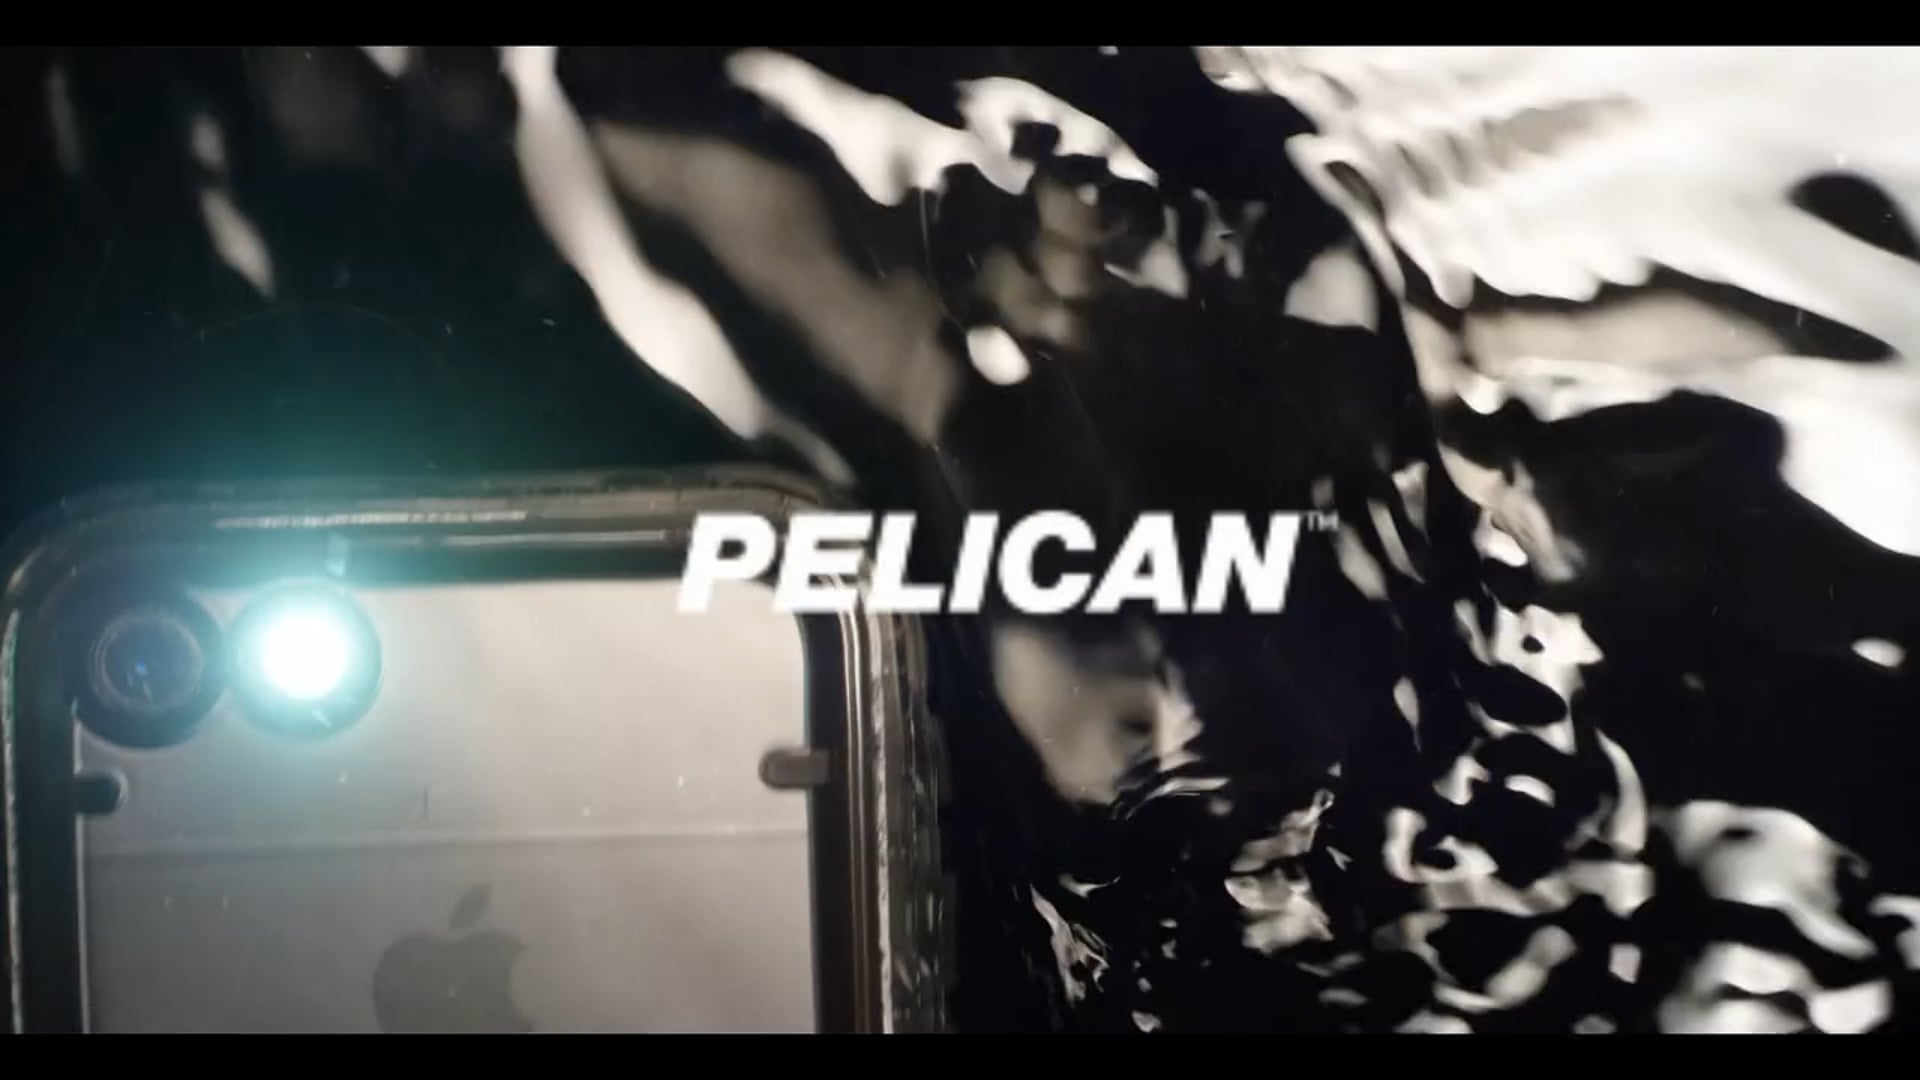 Pelican: Phone Case Testimonial 2min - FINAL